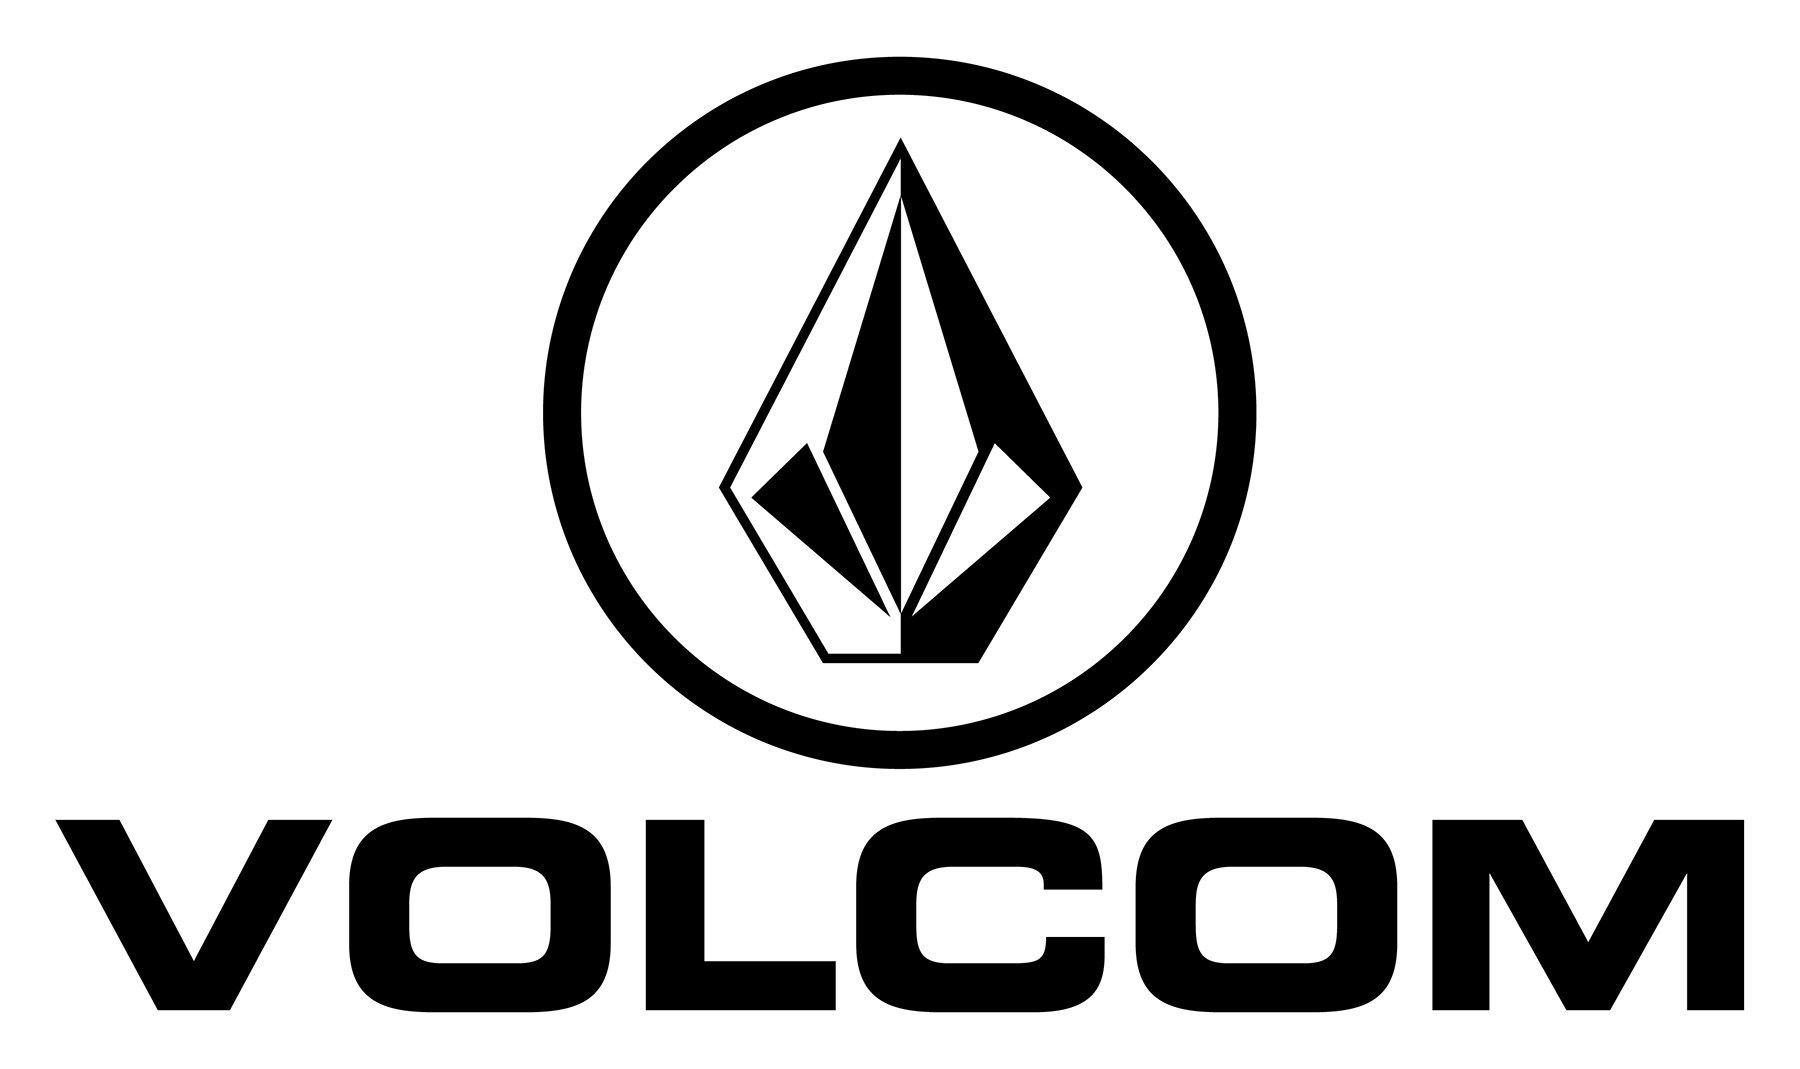 volcom logo volcom symbol meaning history and evolution rh 1000logos net imagenes logos volcom volcom logos